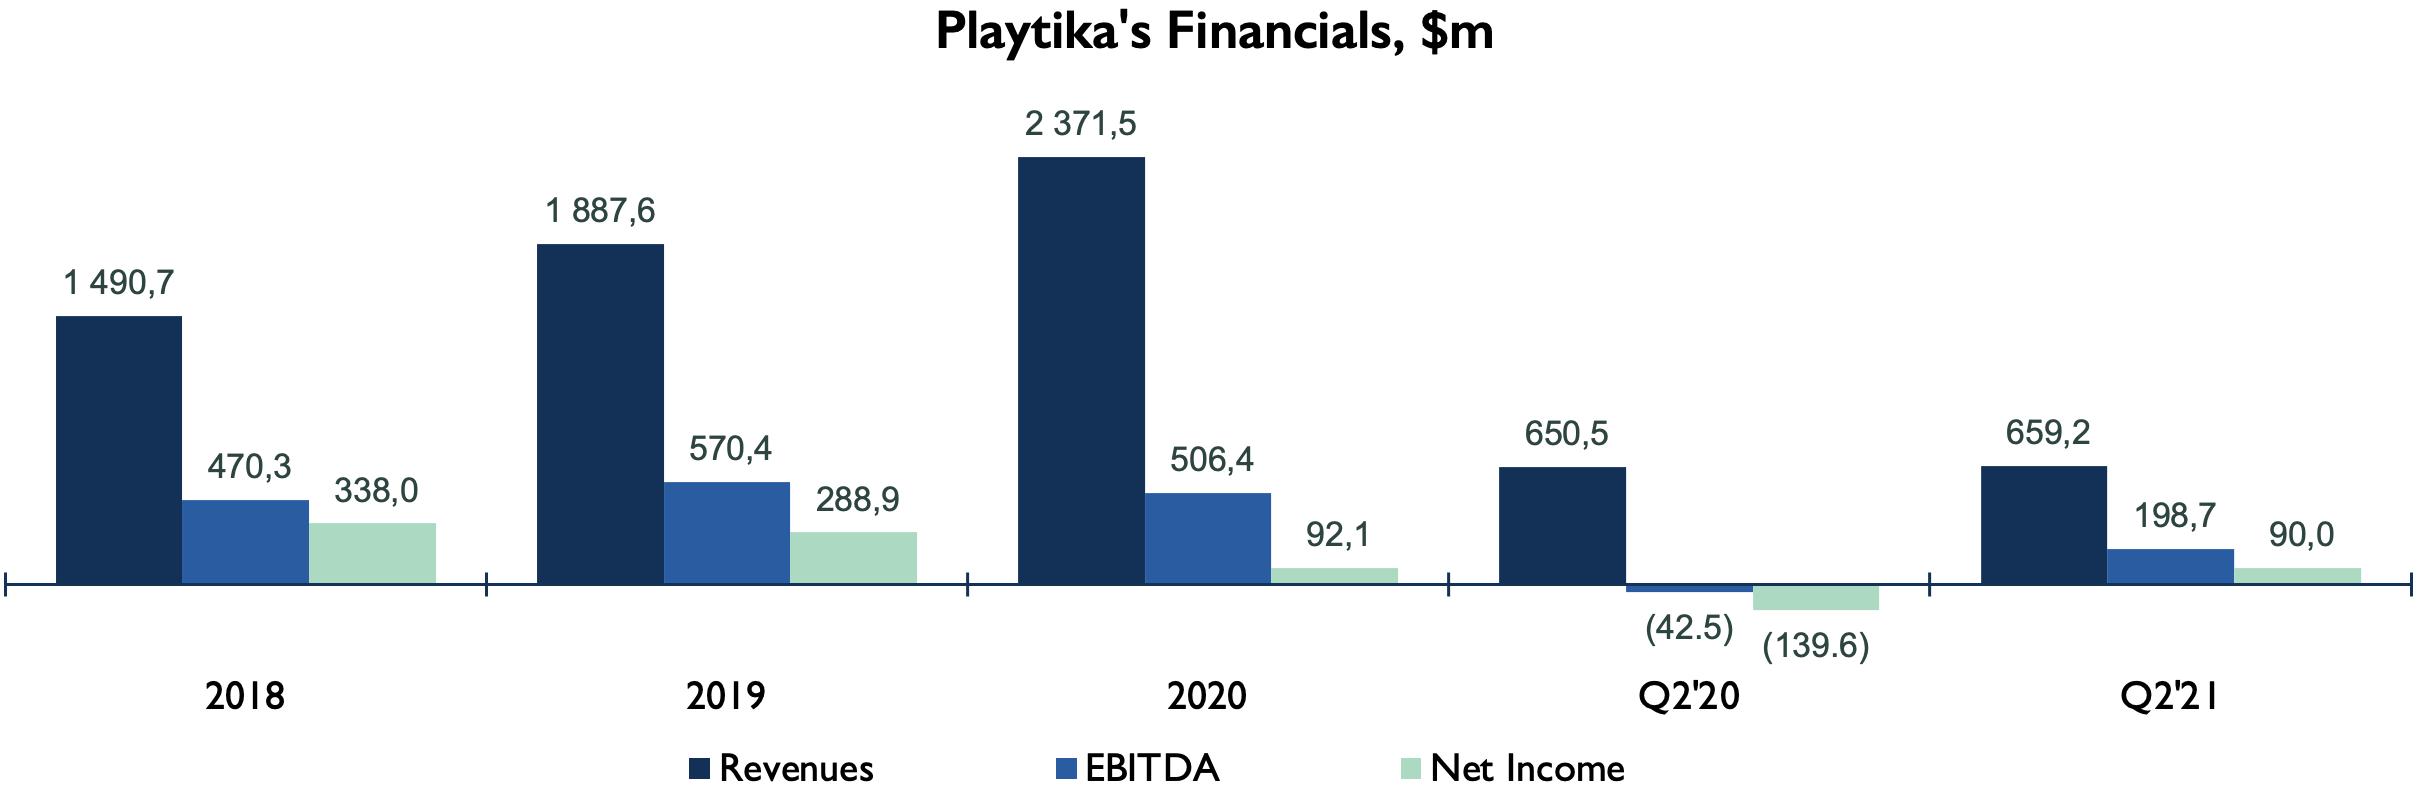 Playtika Financials